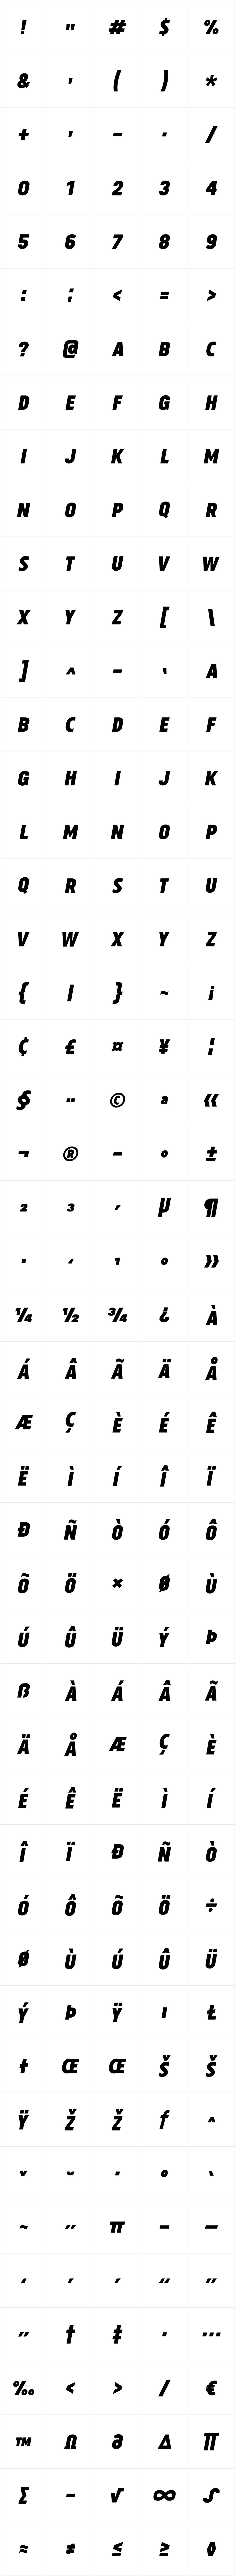 Tolyer Bold no1 Oblique